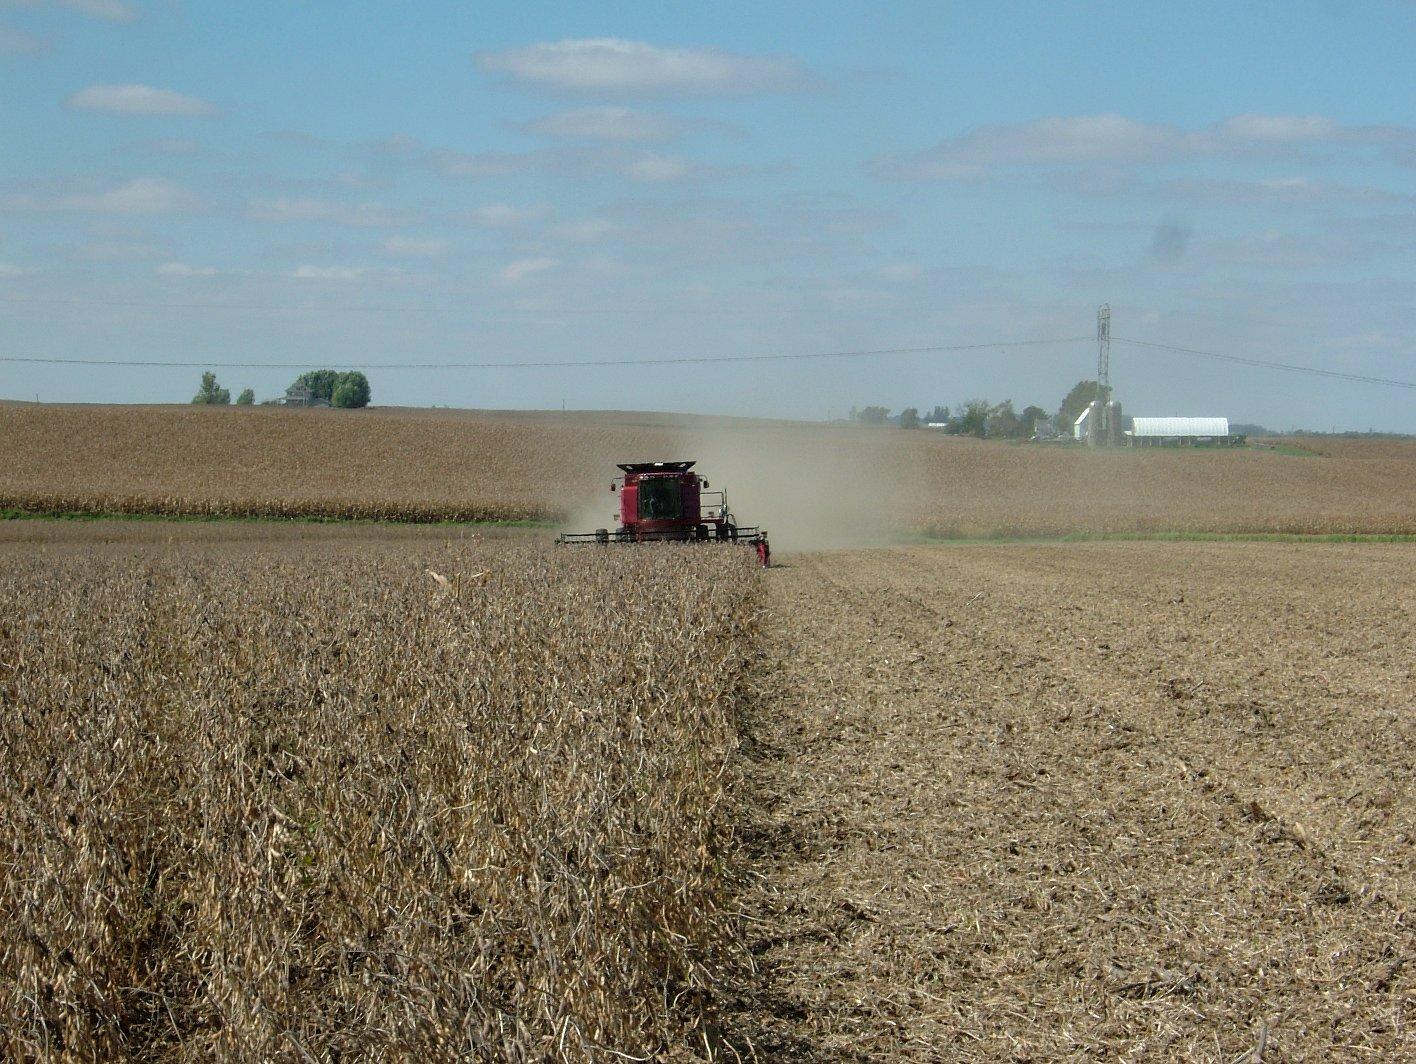 Steering a combine via GPS